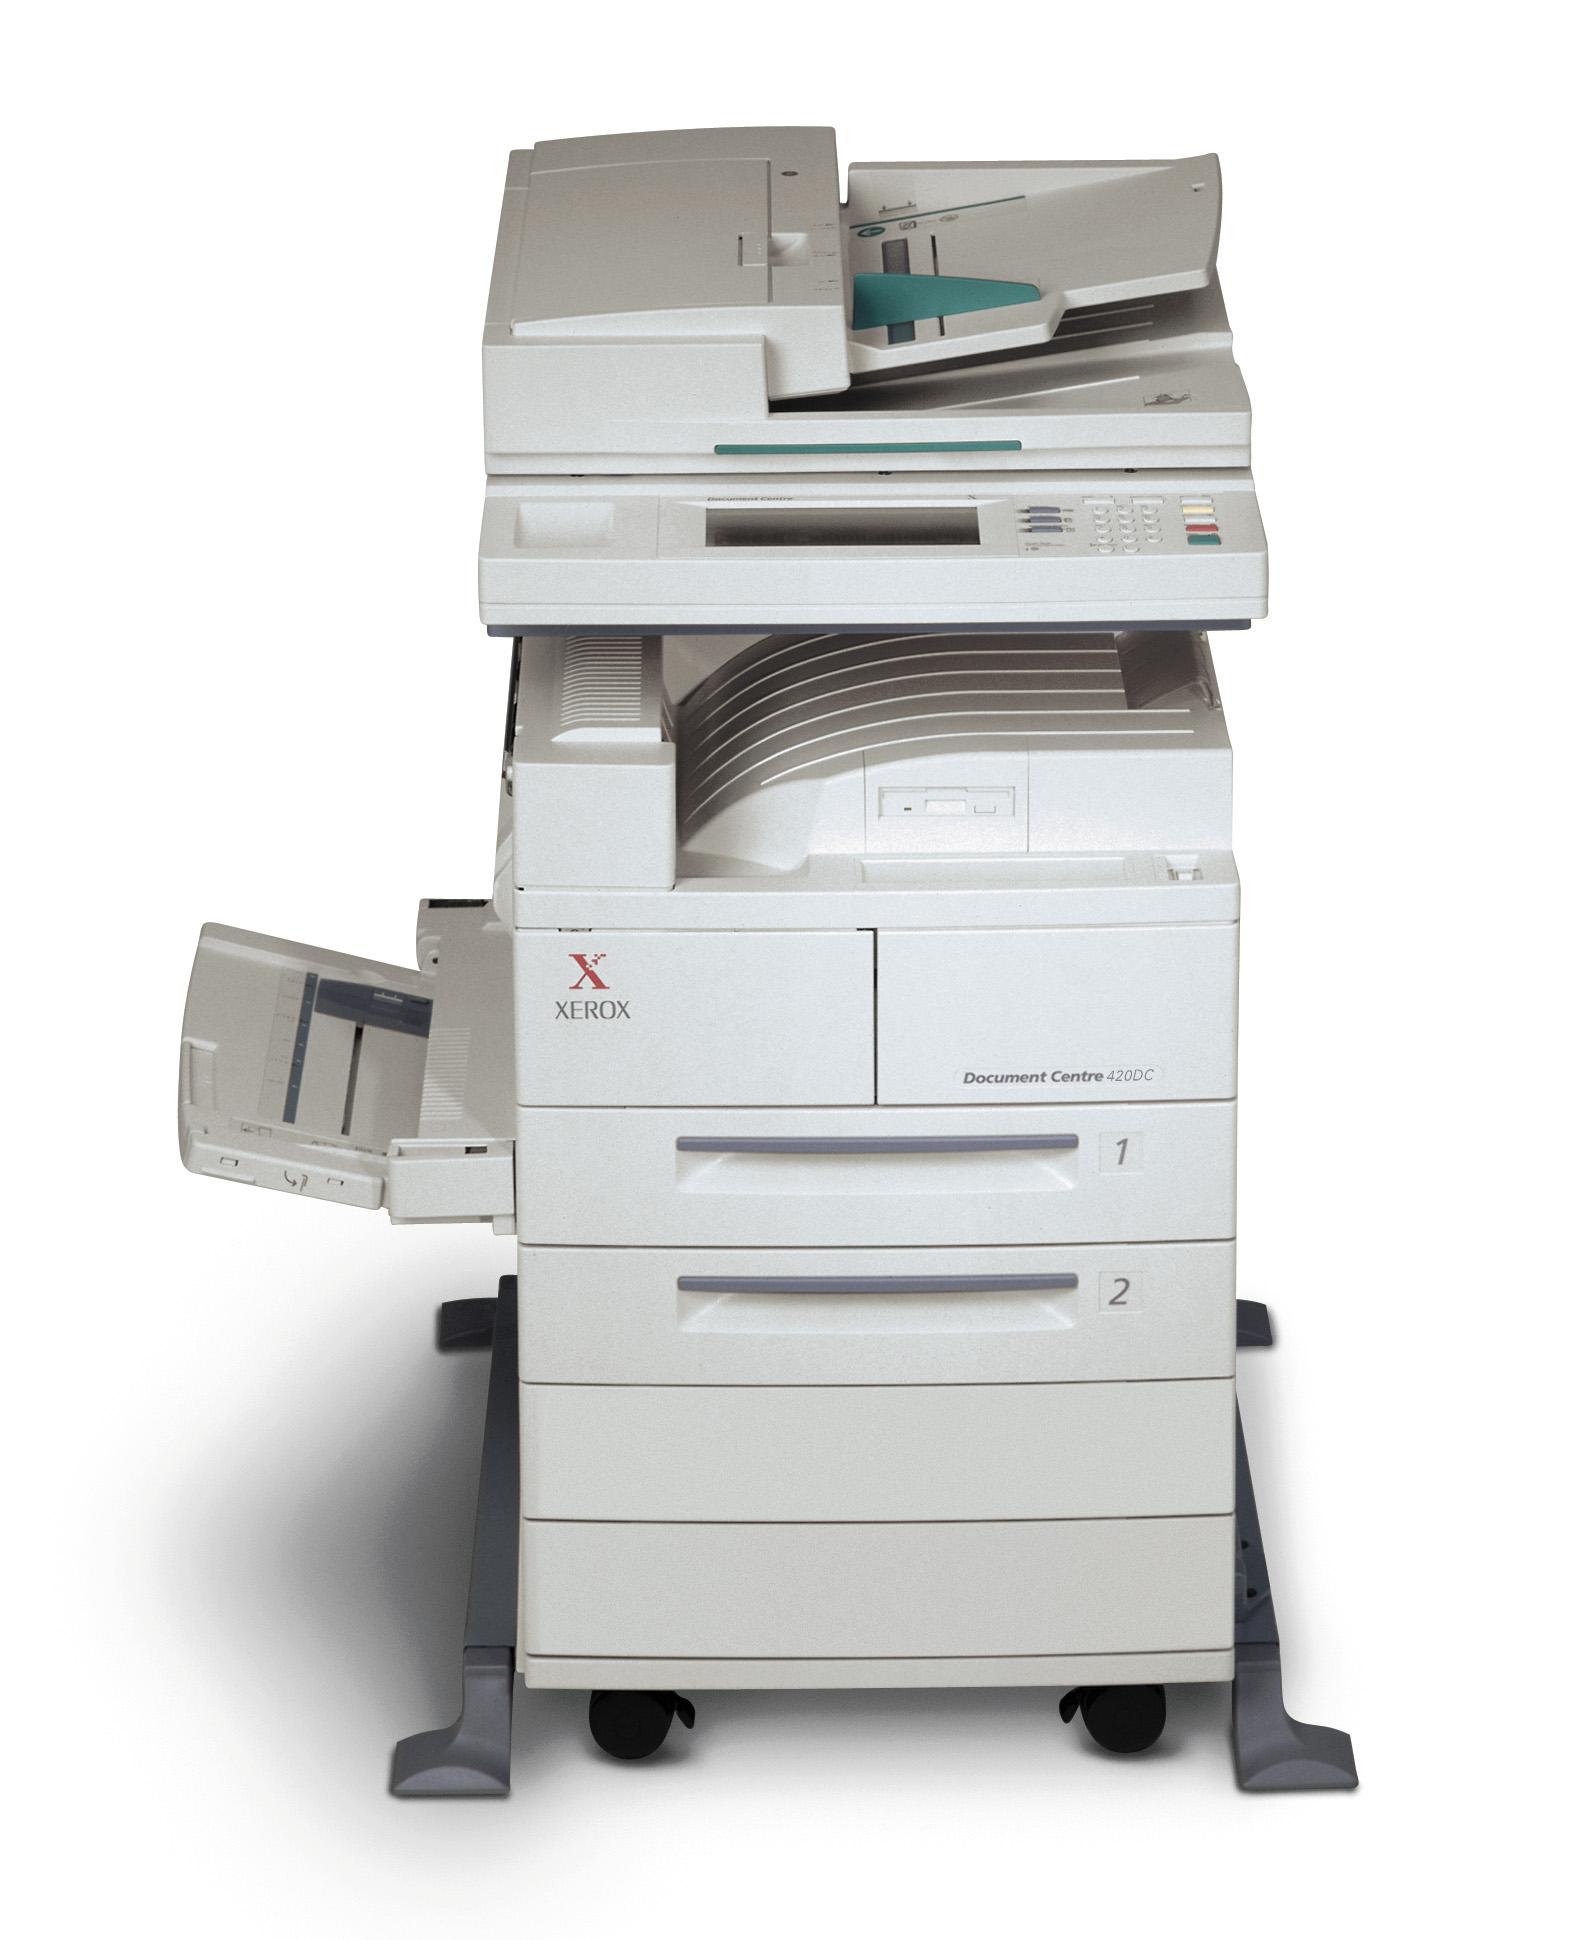 Xerox workcentre pe16 scanner